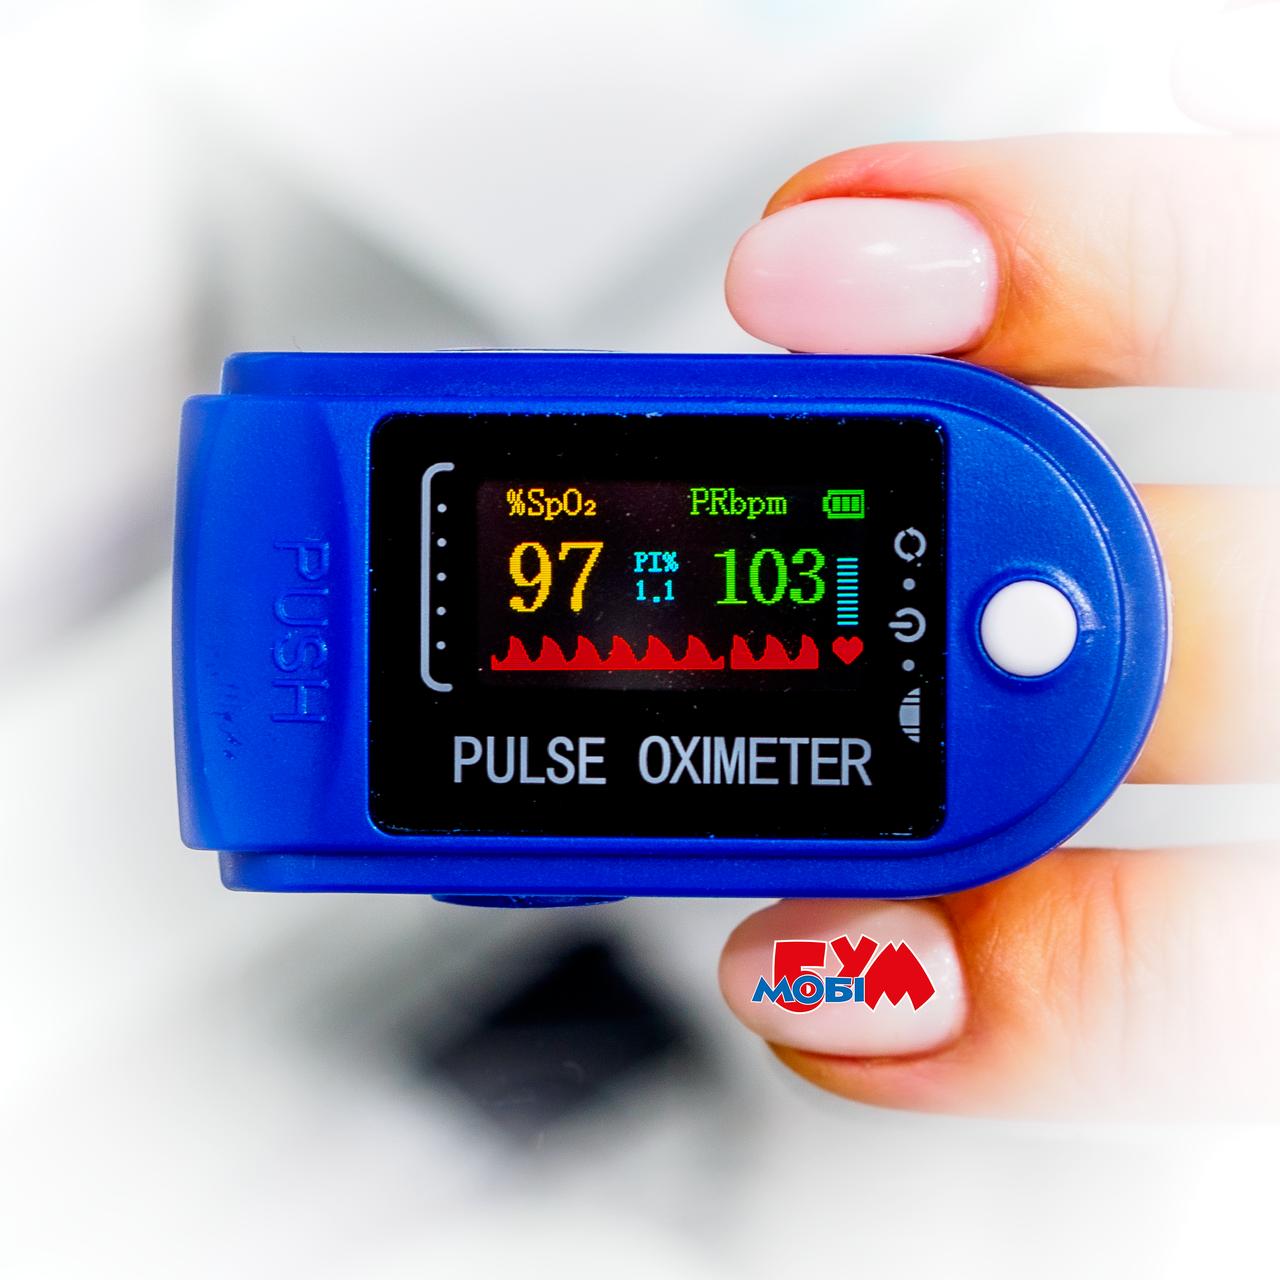 Пульсоксиметр Pulse Oximeter Fingertip LK88 White/Blue